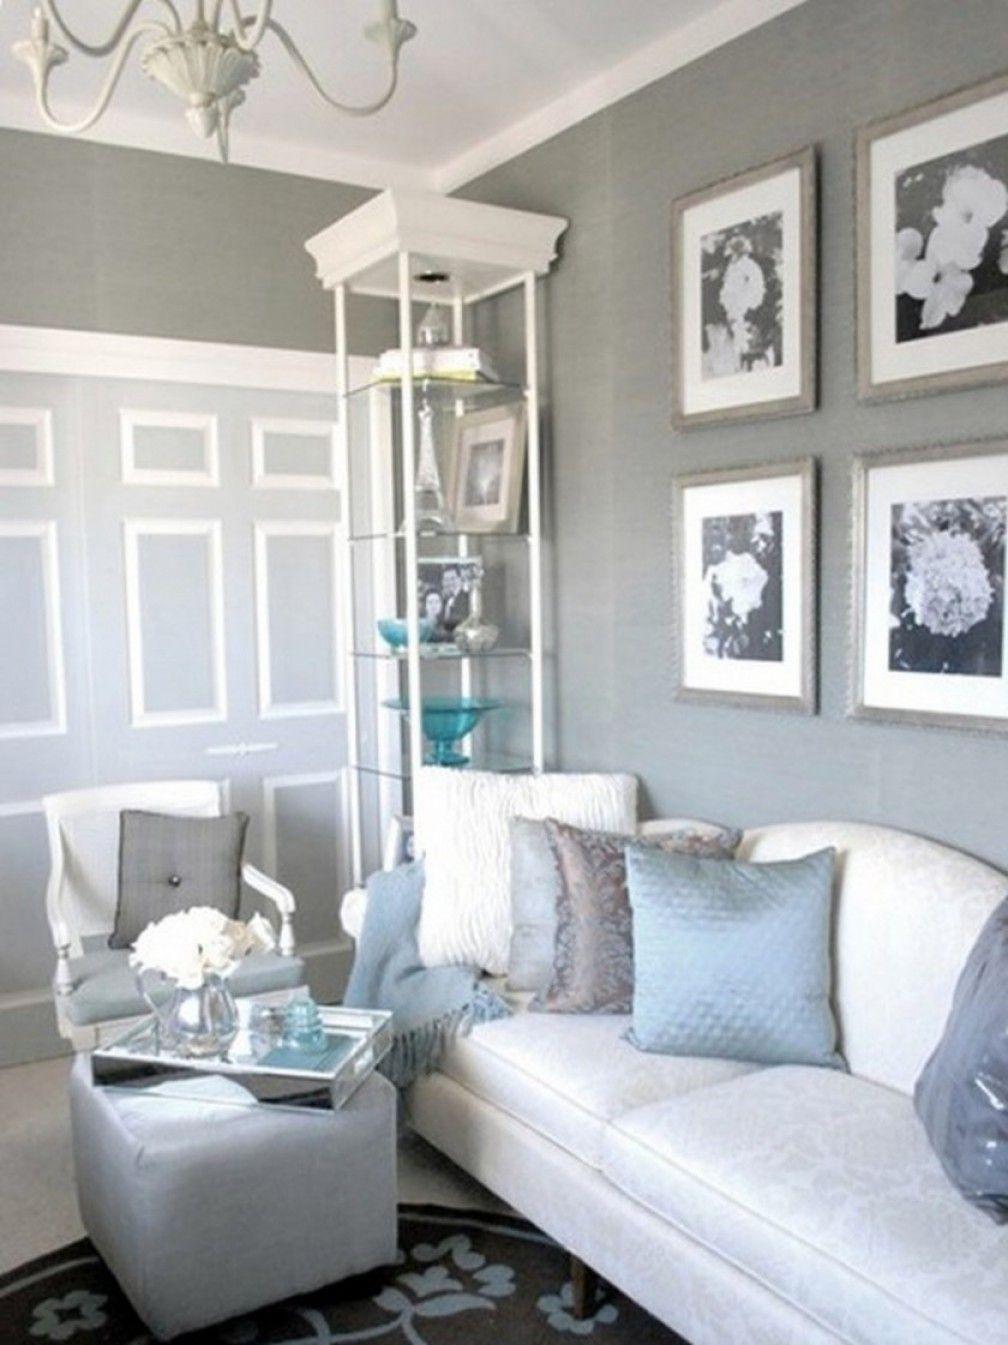 Bedroom colors blue gray - Blue Bedroom Decoration Artistic Decorating Grey